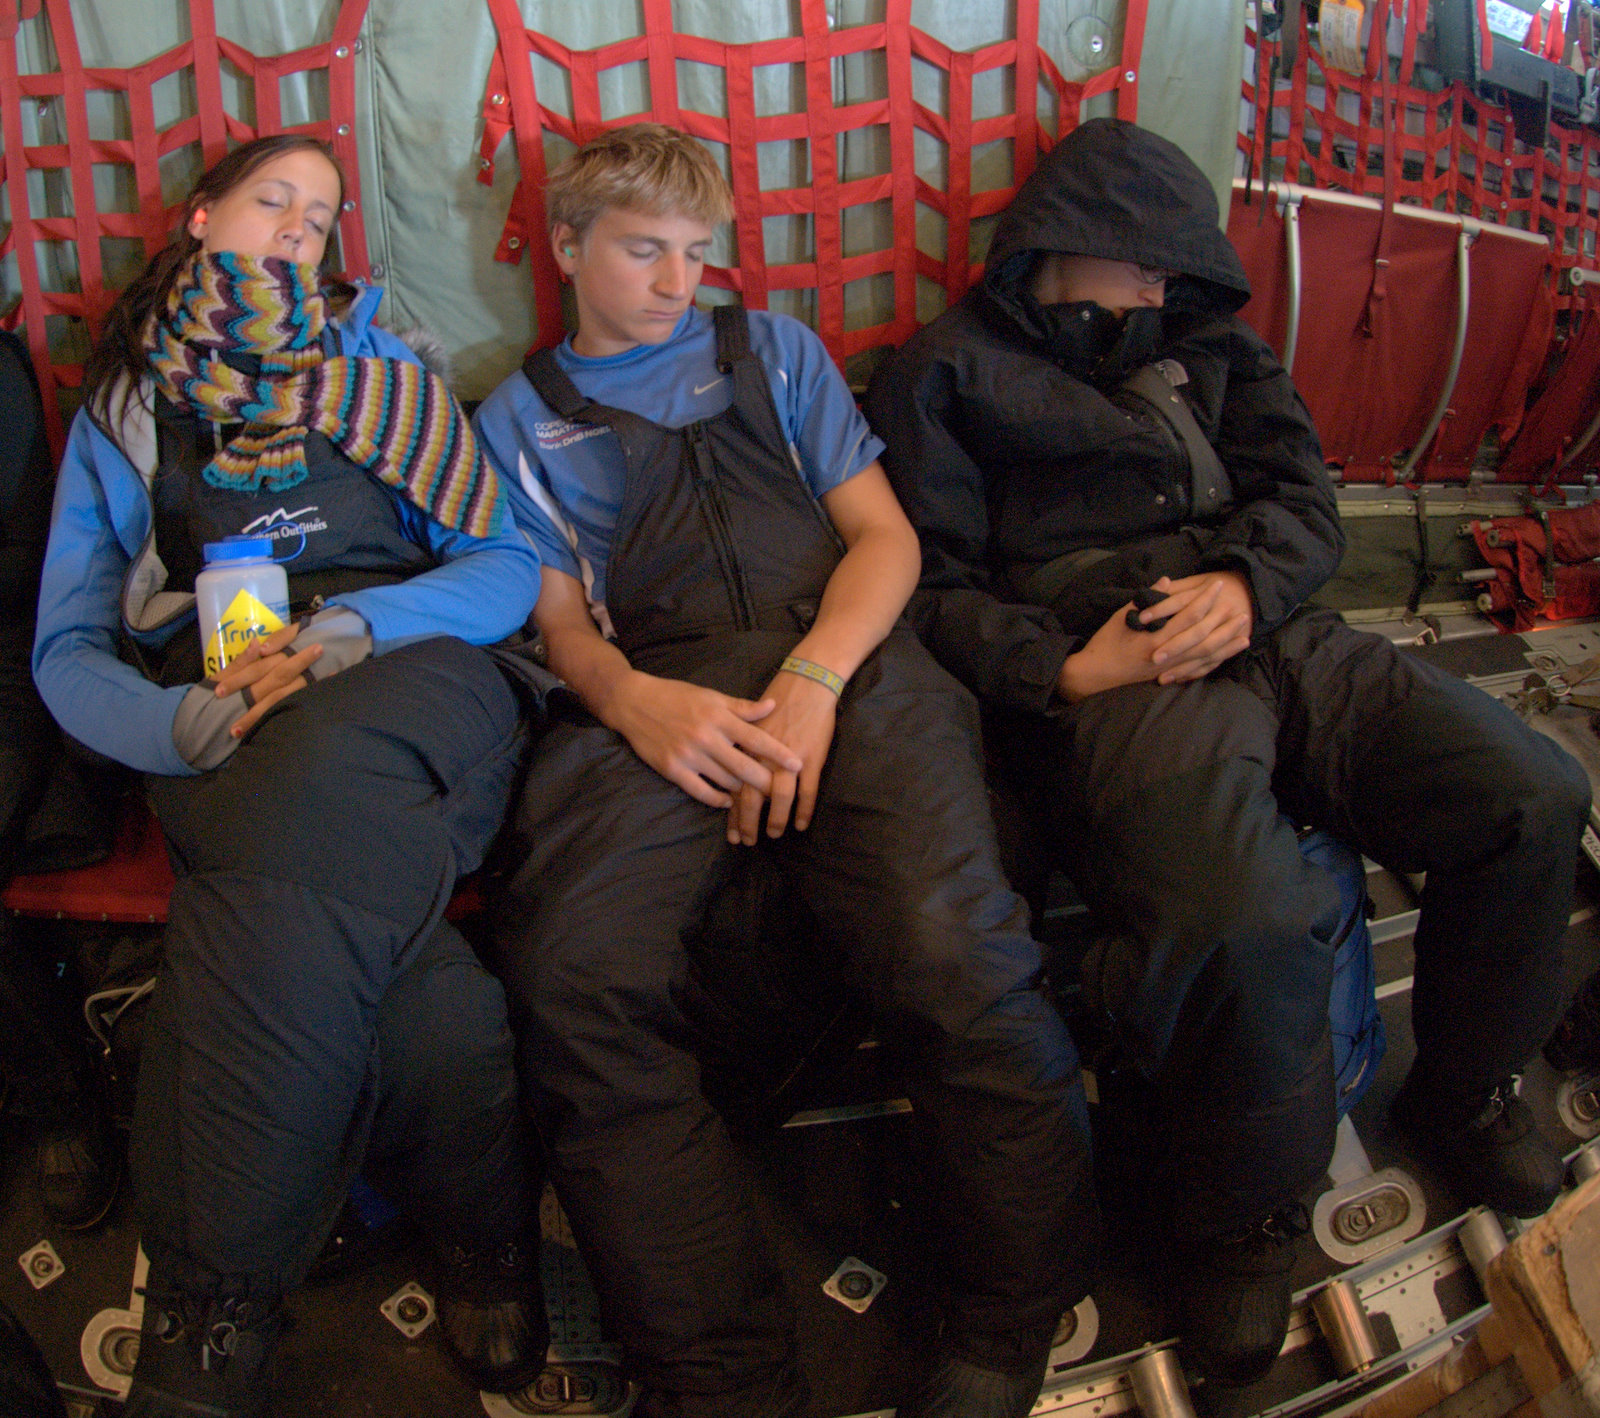 Danish students (L-R) Trine Madsen, Davis Thing, and Sam Hansen return to Kangerlussuaq after an eventful four days at Summit.